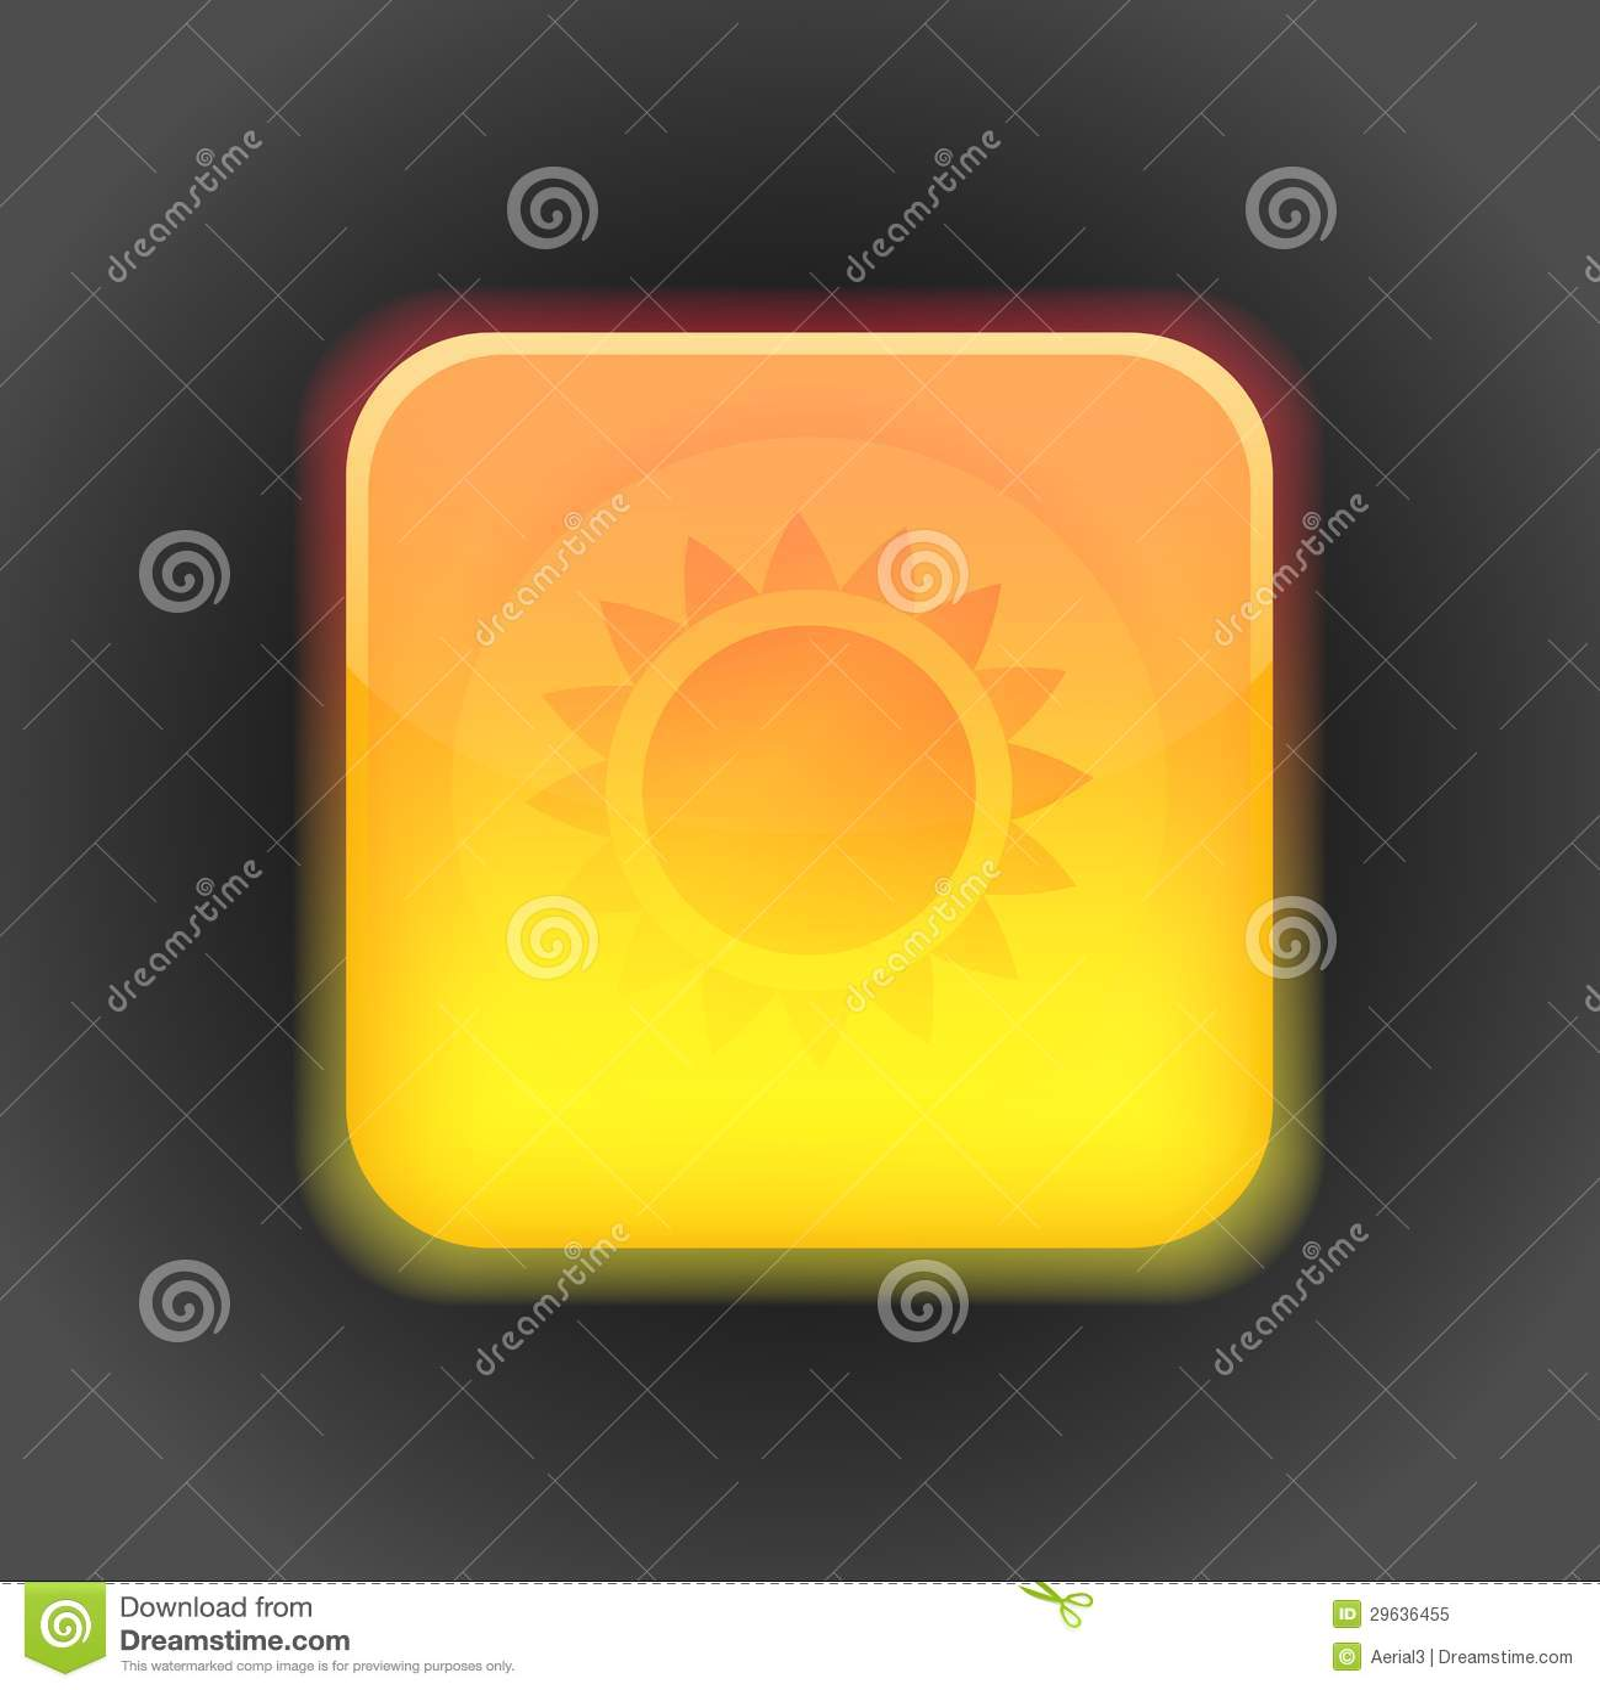 Sunny App